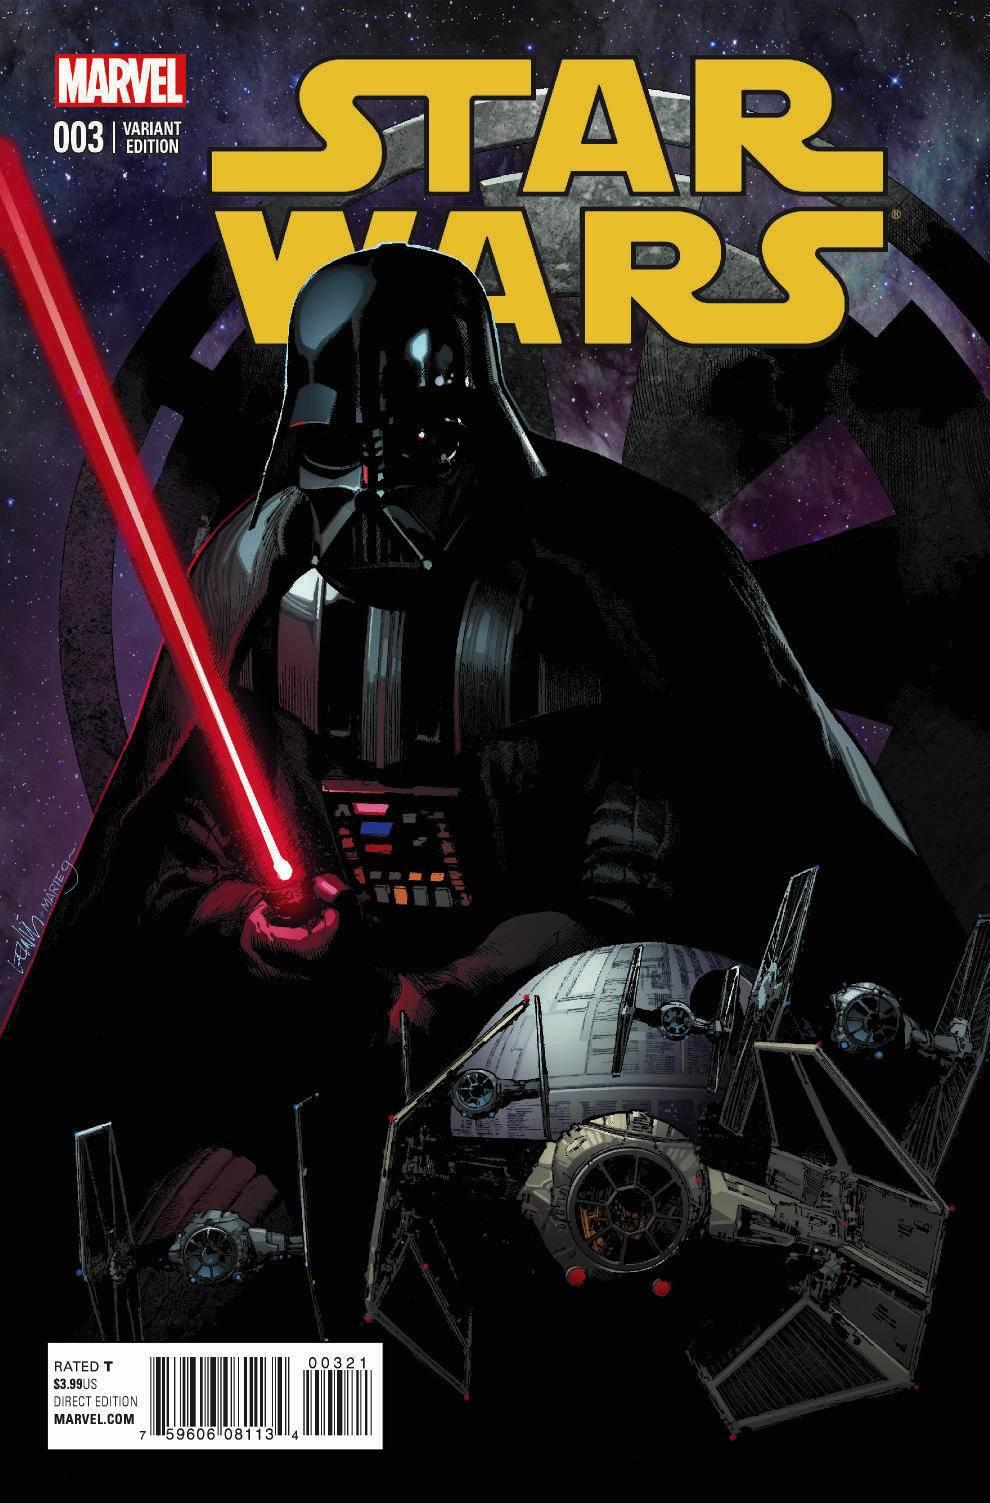 Star Wars #3 (Leinil Francis Yu Variant Cover) (11.03.2015)